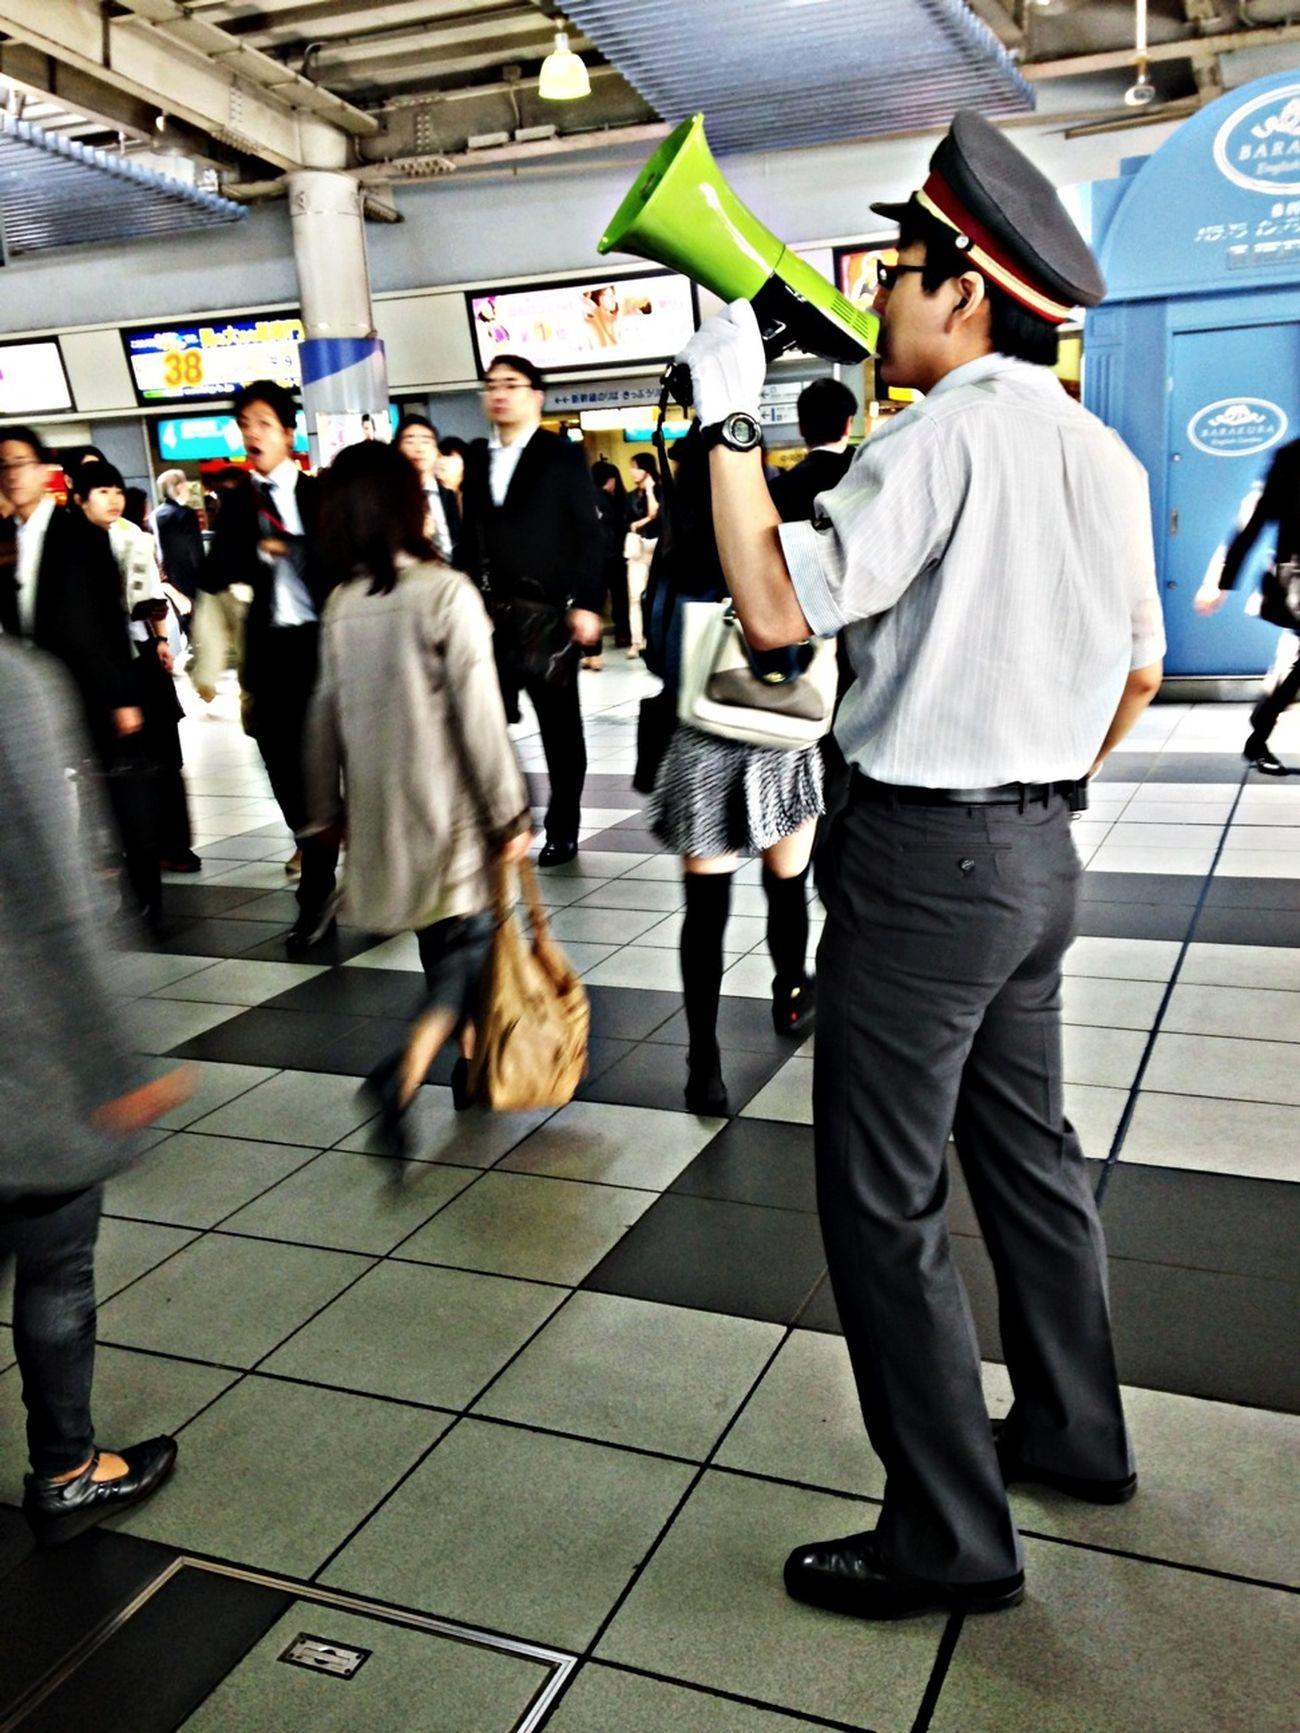 Commuting Rush Hour Public Transportation Making Noise